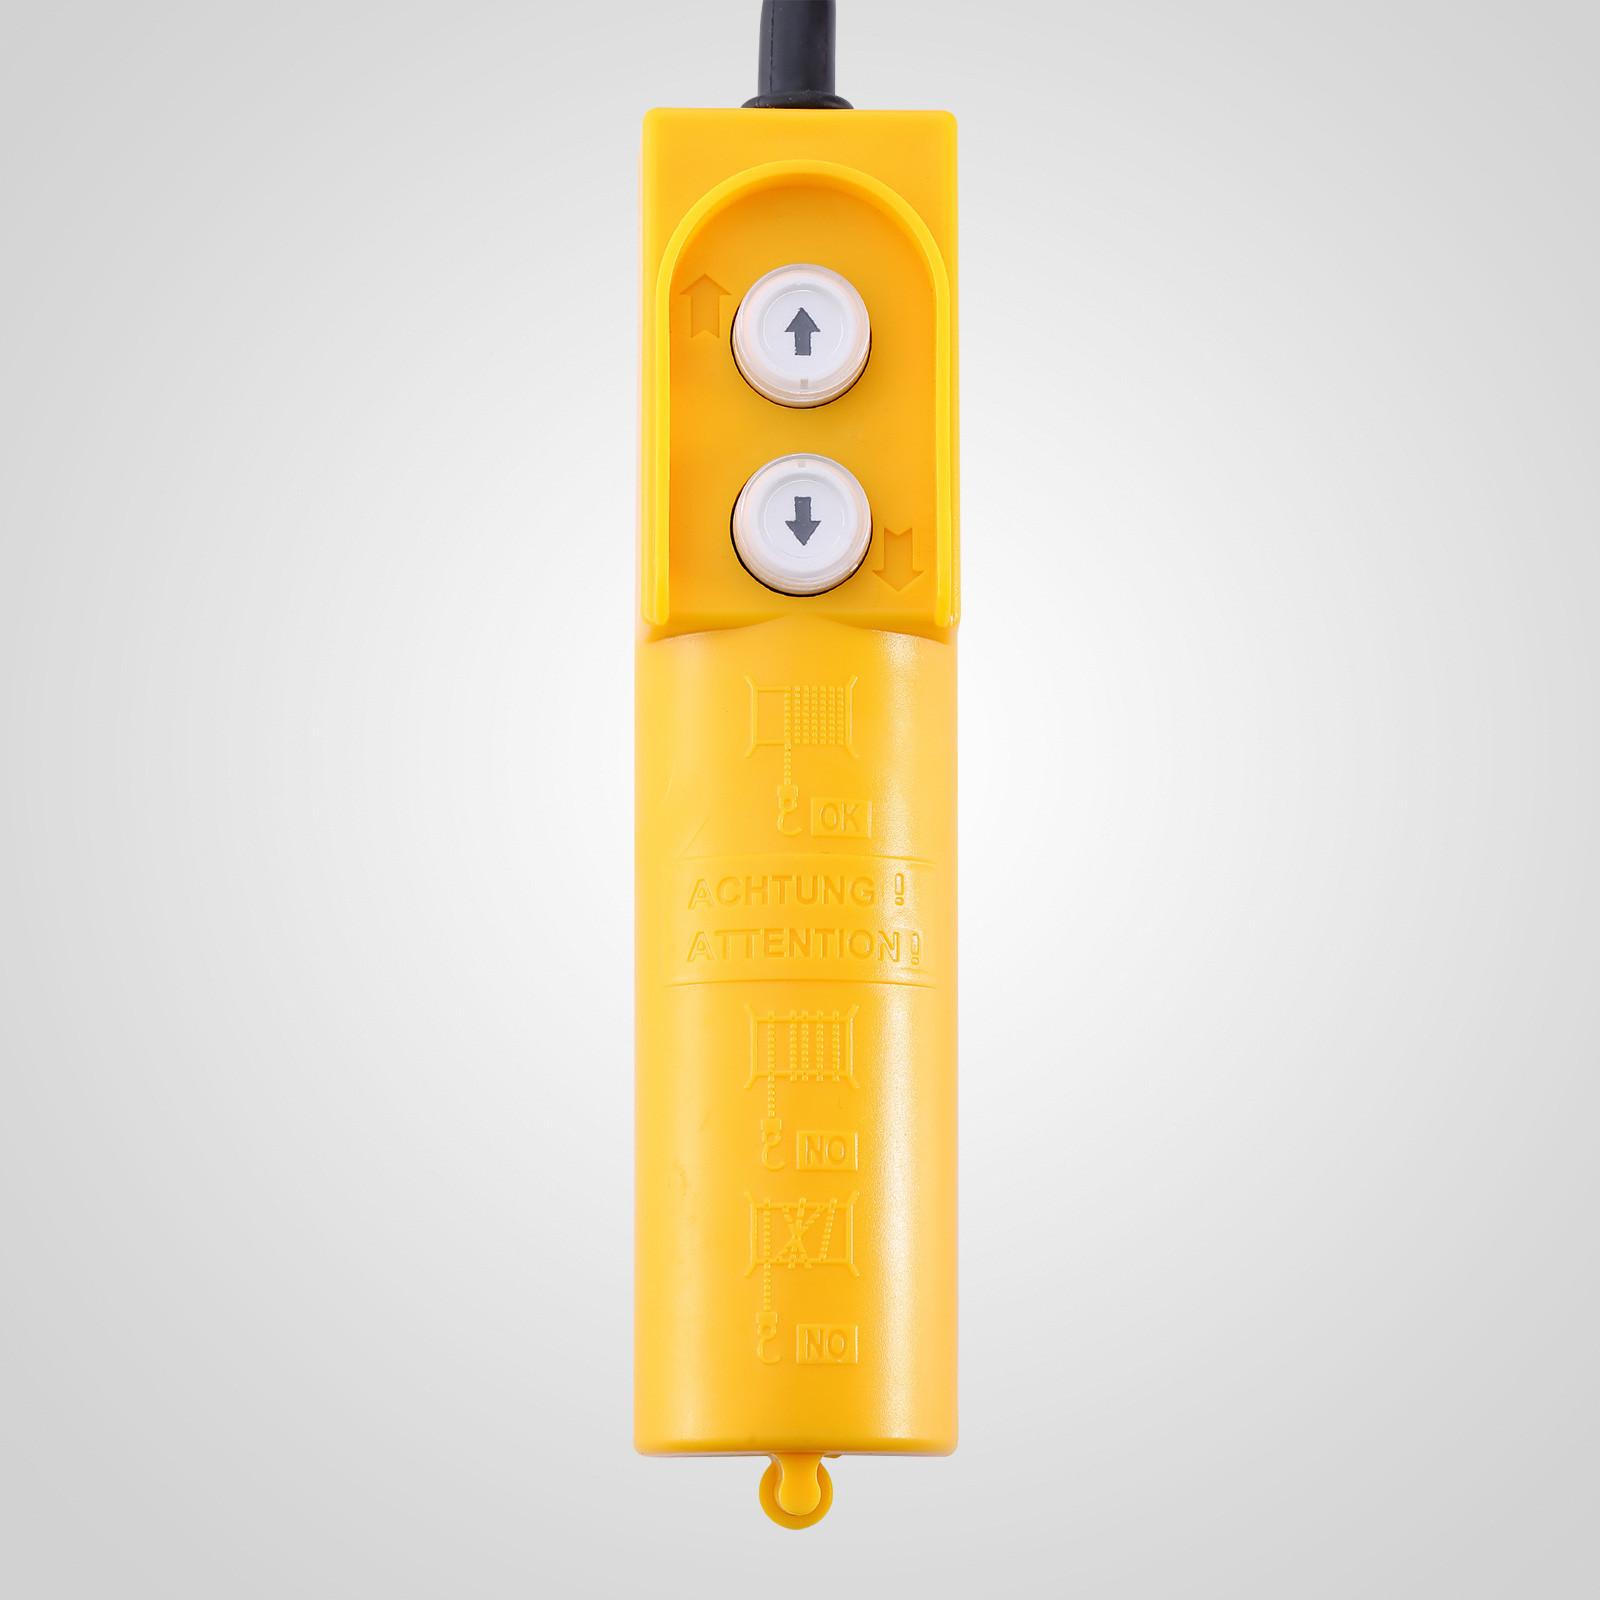 100kg-900kg-Electric-Hoist-Winch-Lifting-Engine-Crane-Cable-Lift-Hook-Garage miniature 23